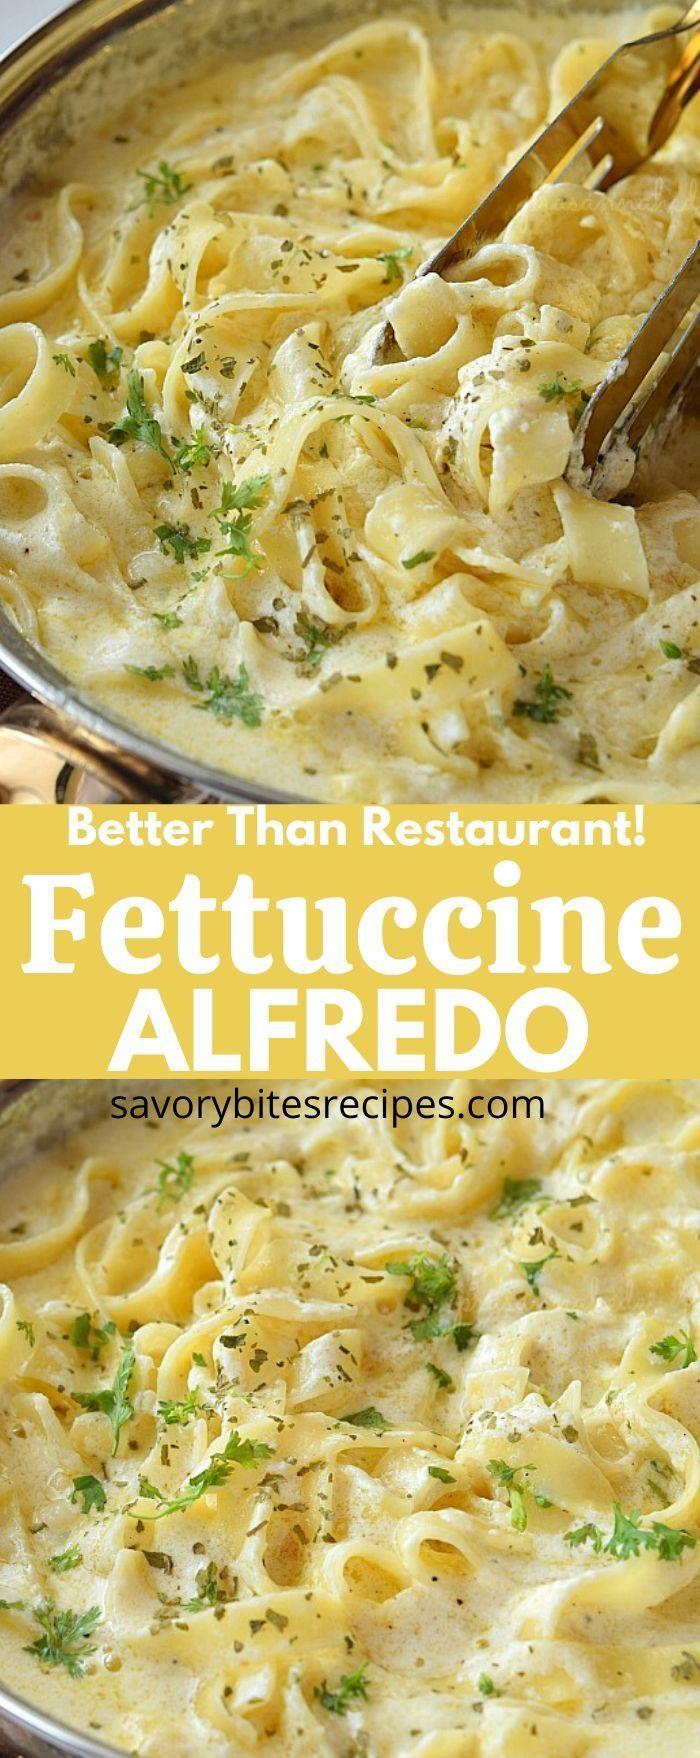 Olive Garden Fettuccine Alfredo Shrimprecipes